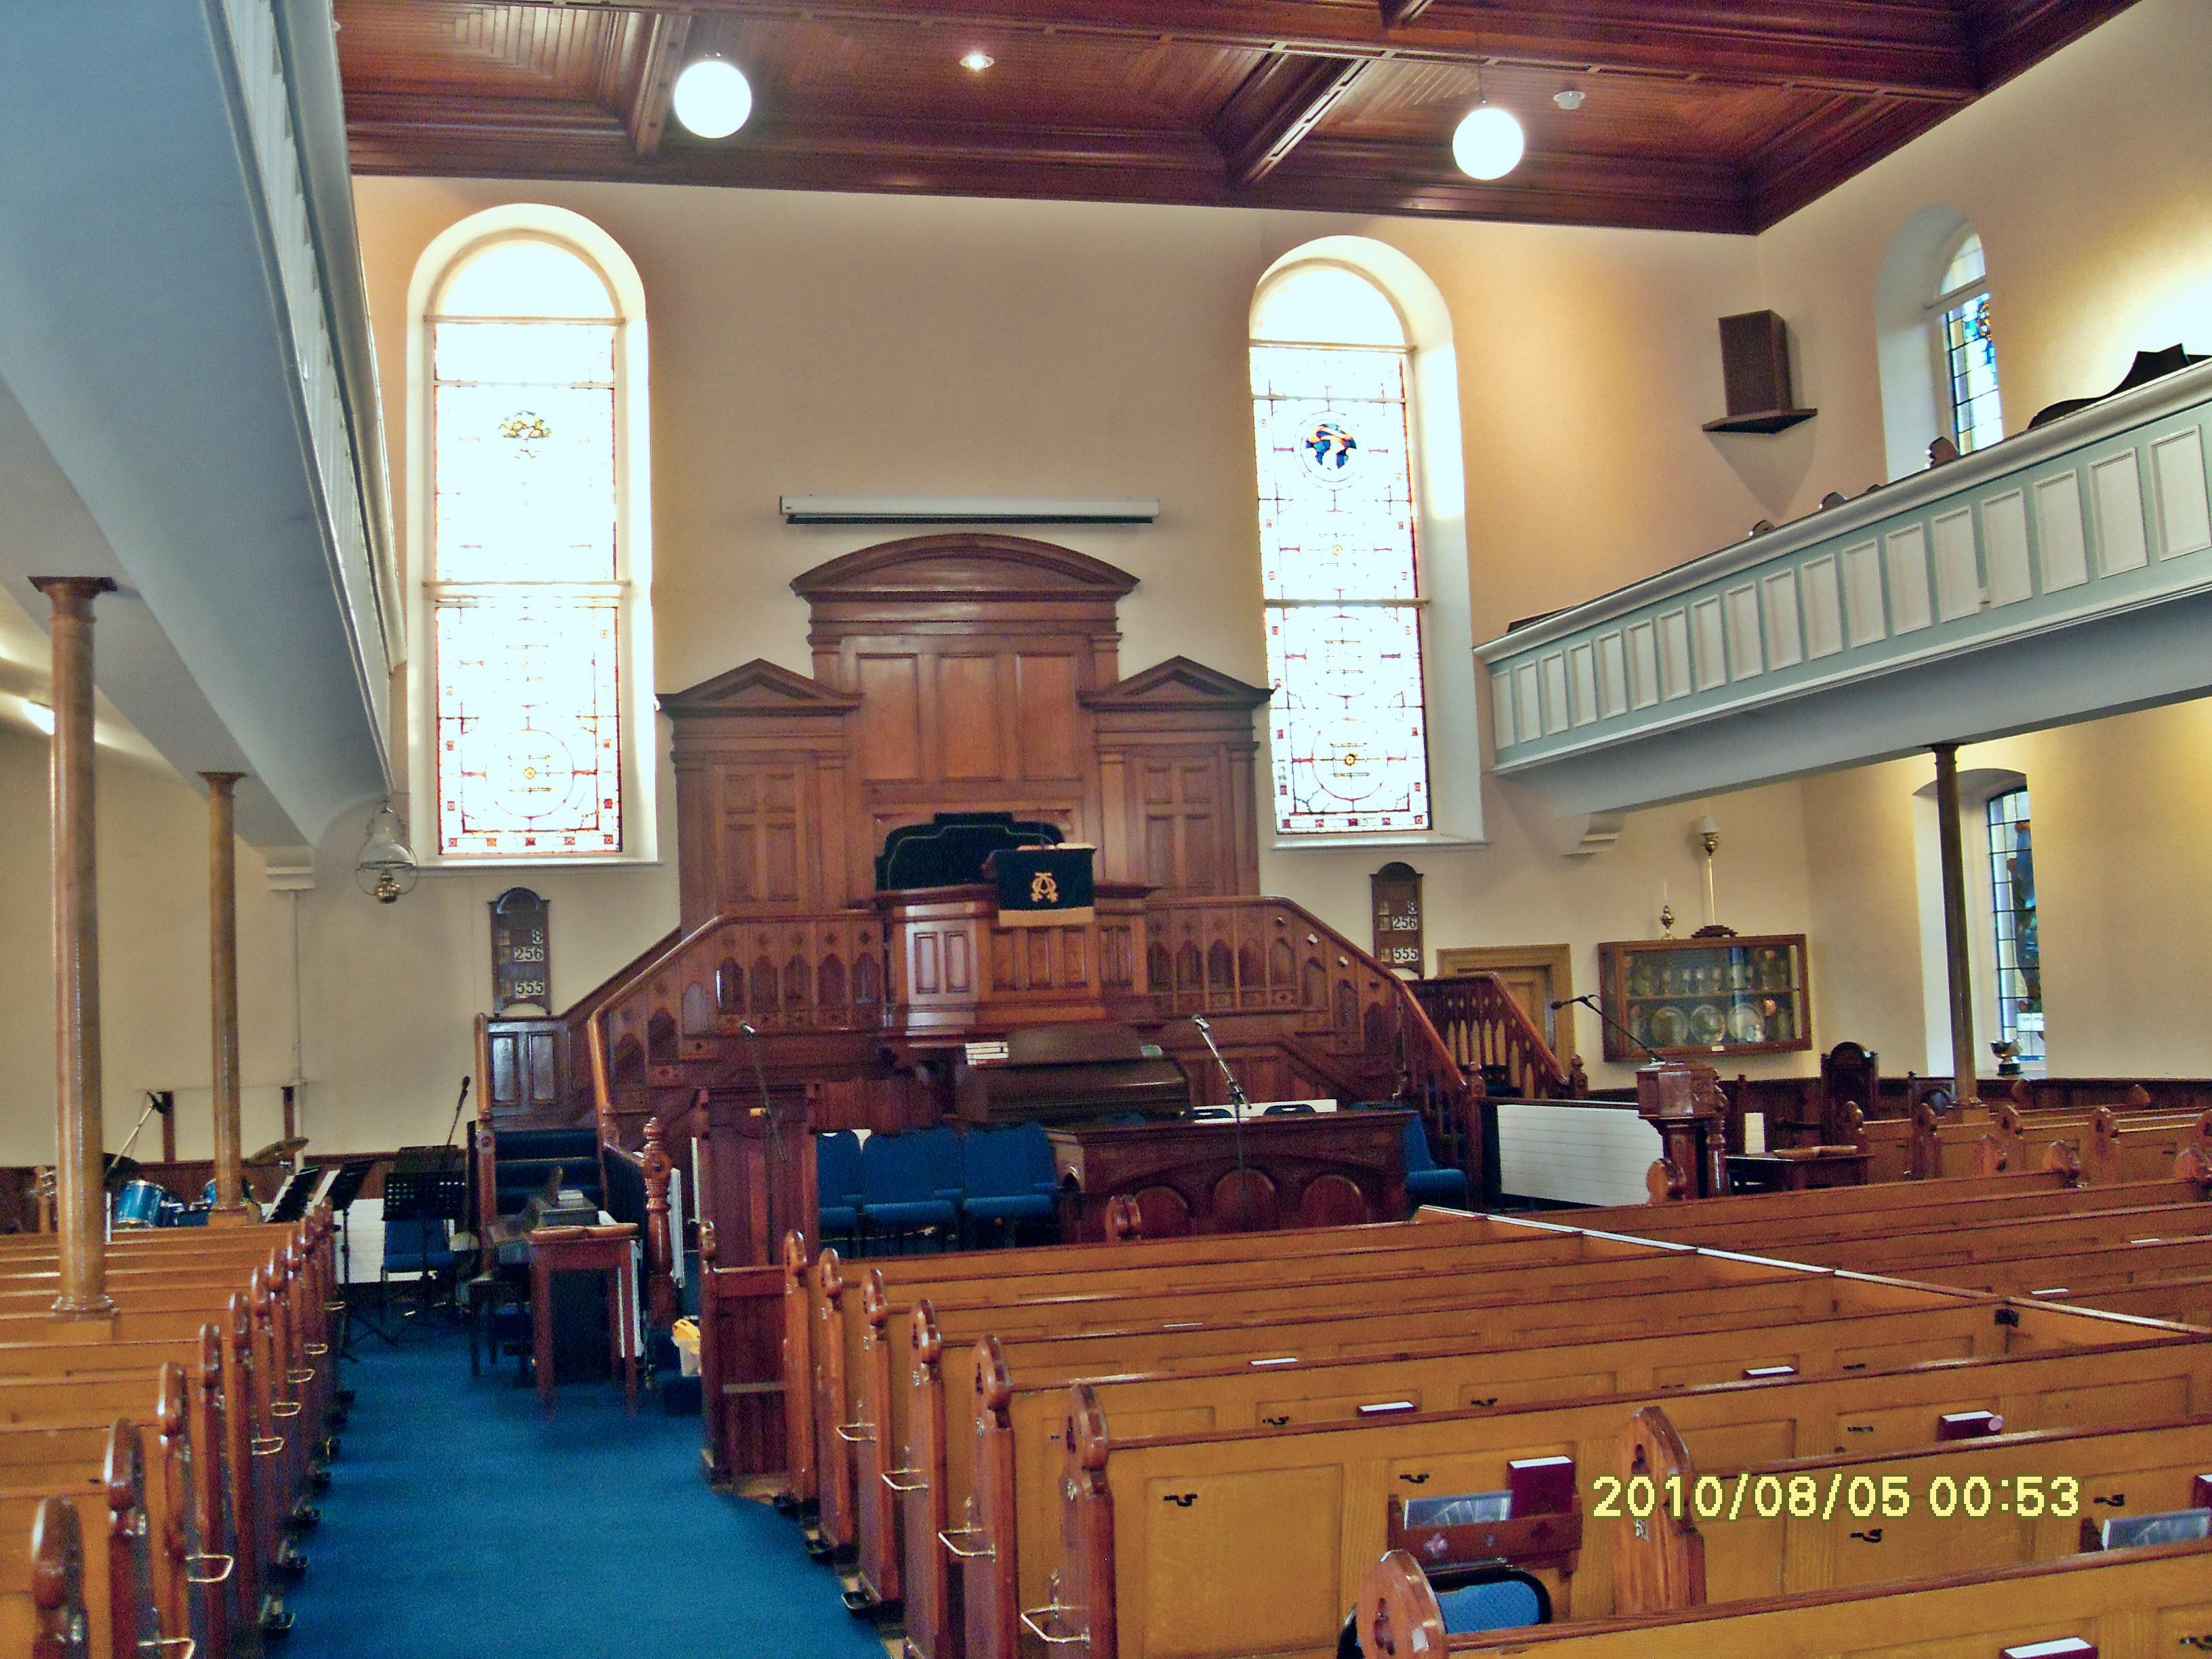 AGHADOWEY, Aghadowey Presbyterian church interior